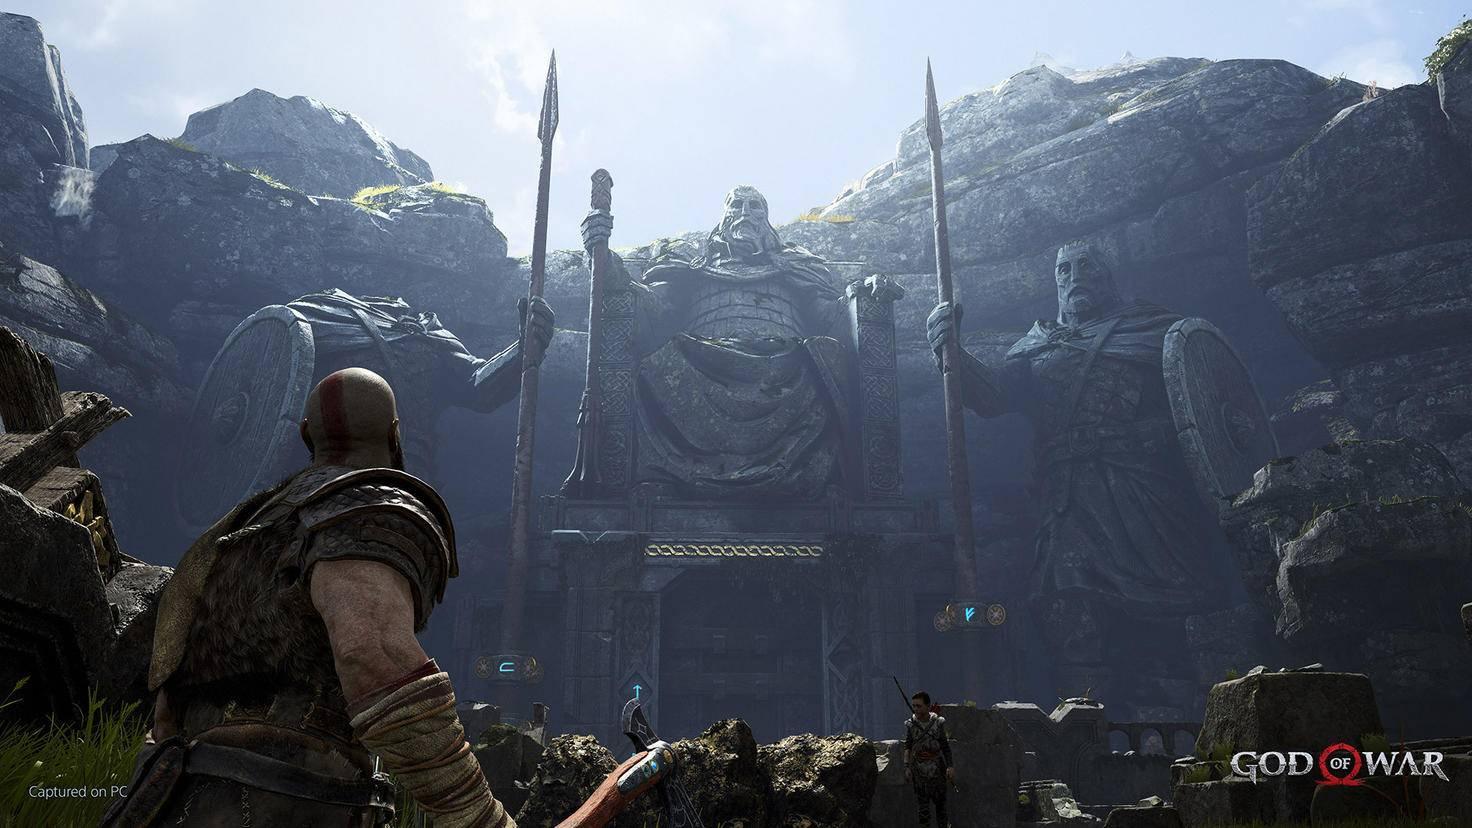 god-of-war-pc-screenshot-1